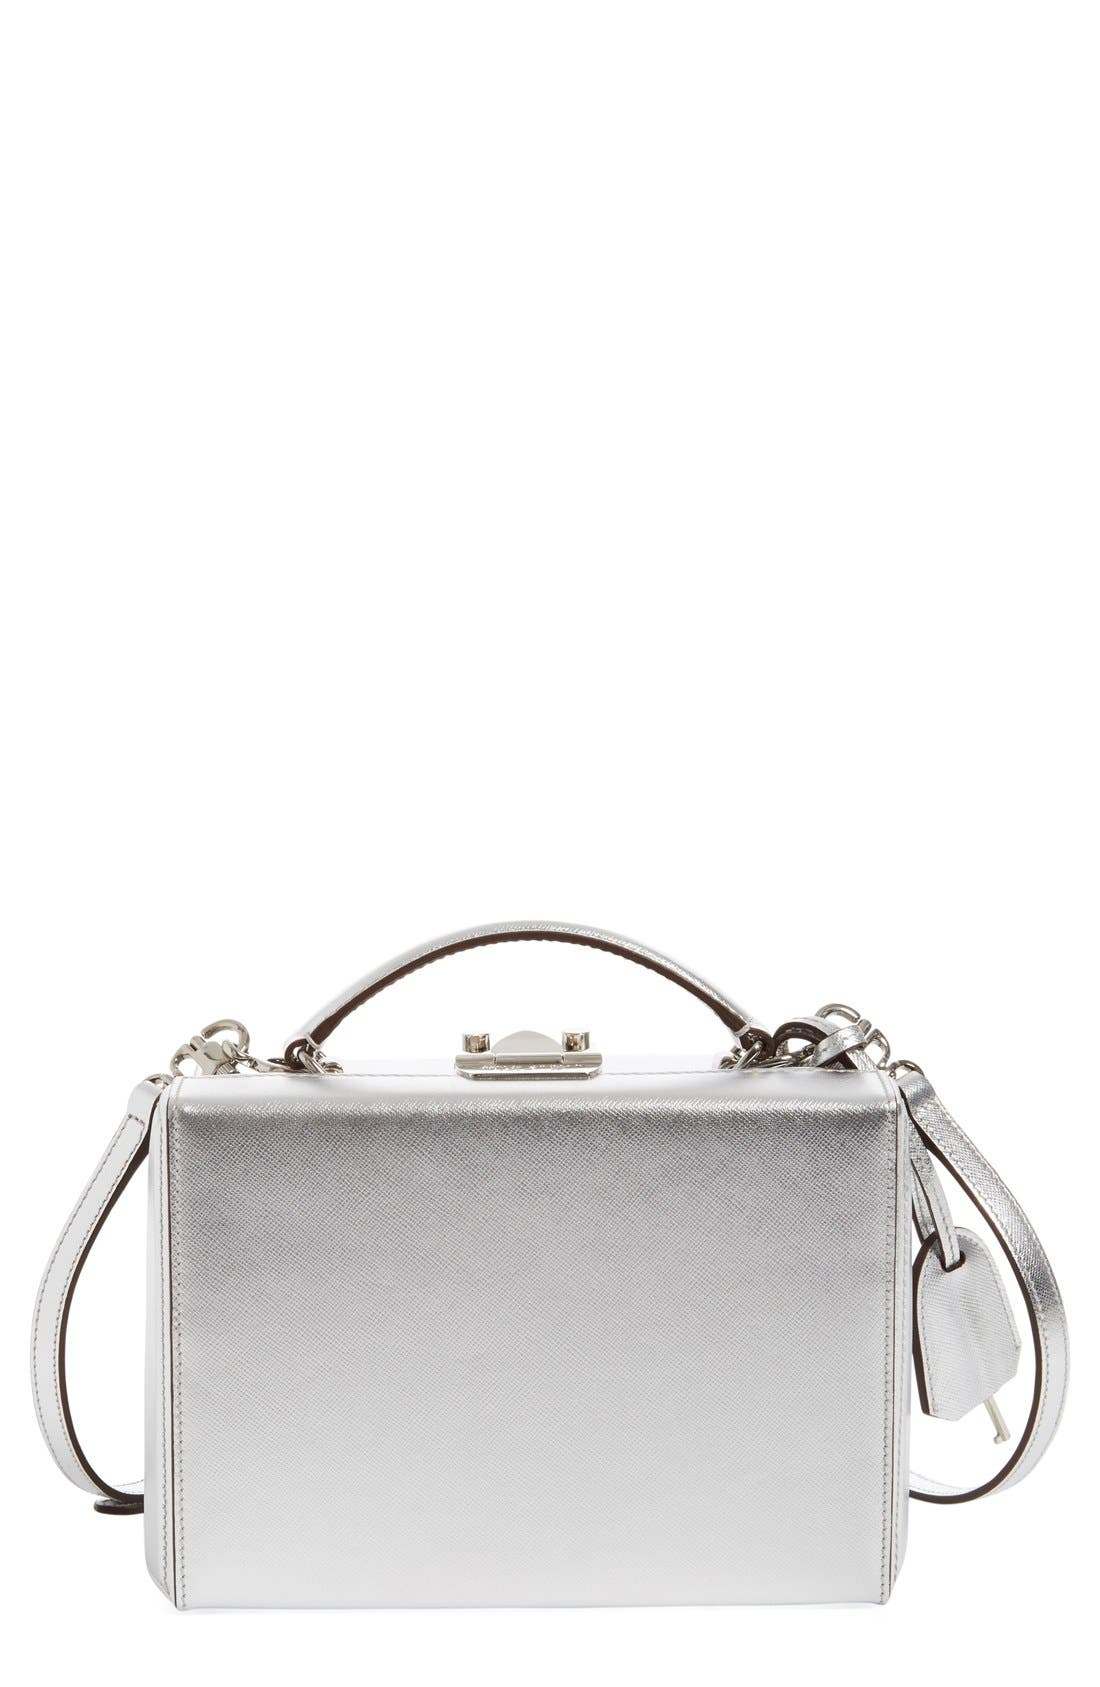 Main Image - Mark Cross 'Small Grace' Metallic Saffiano Leather Box Clutch